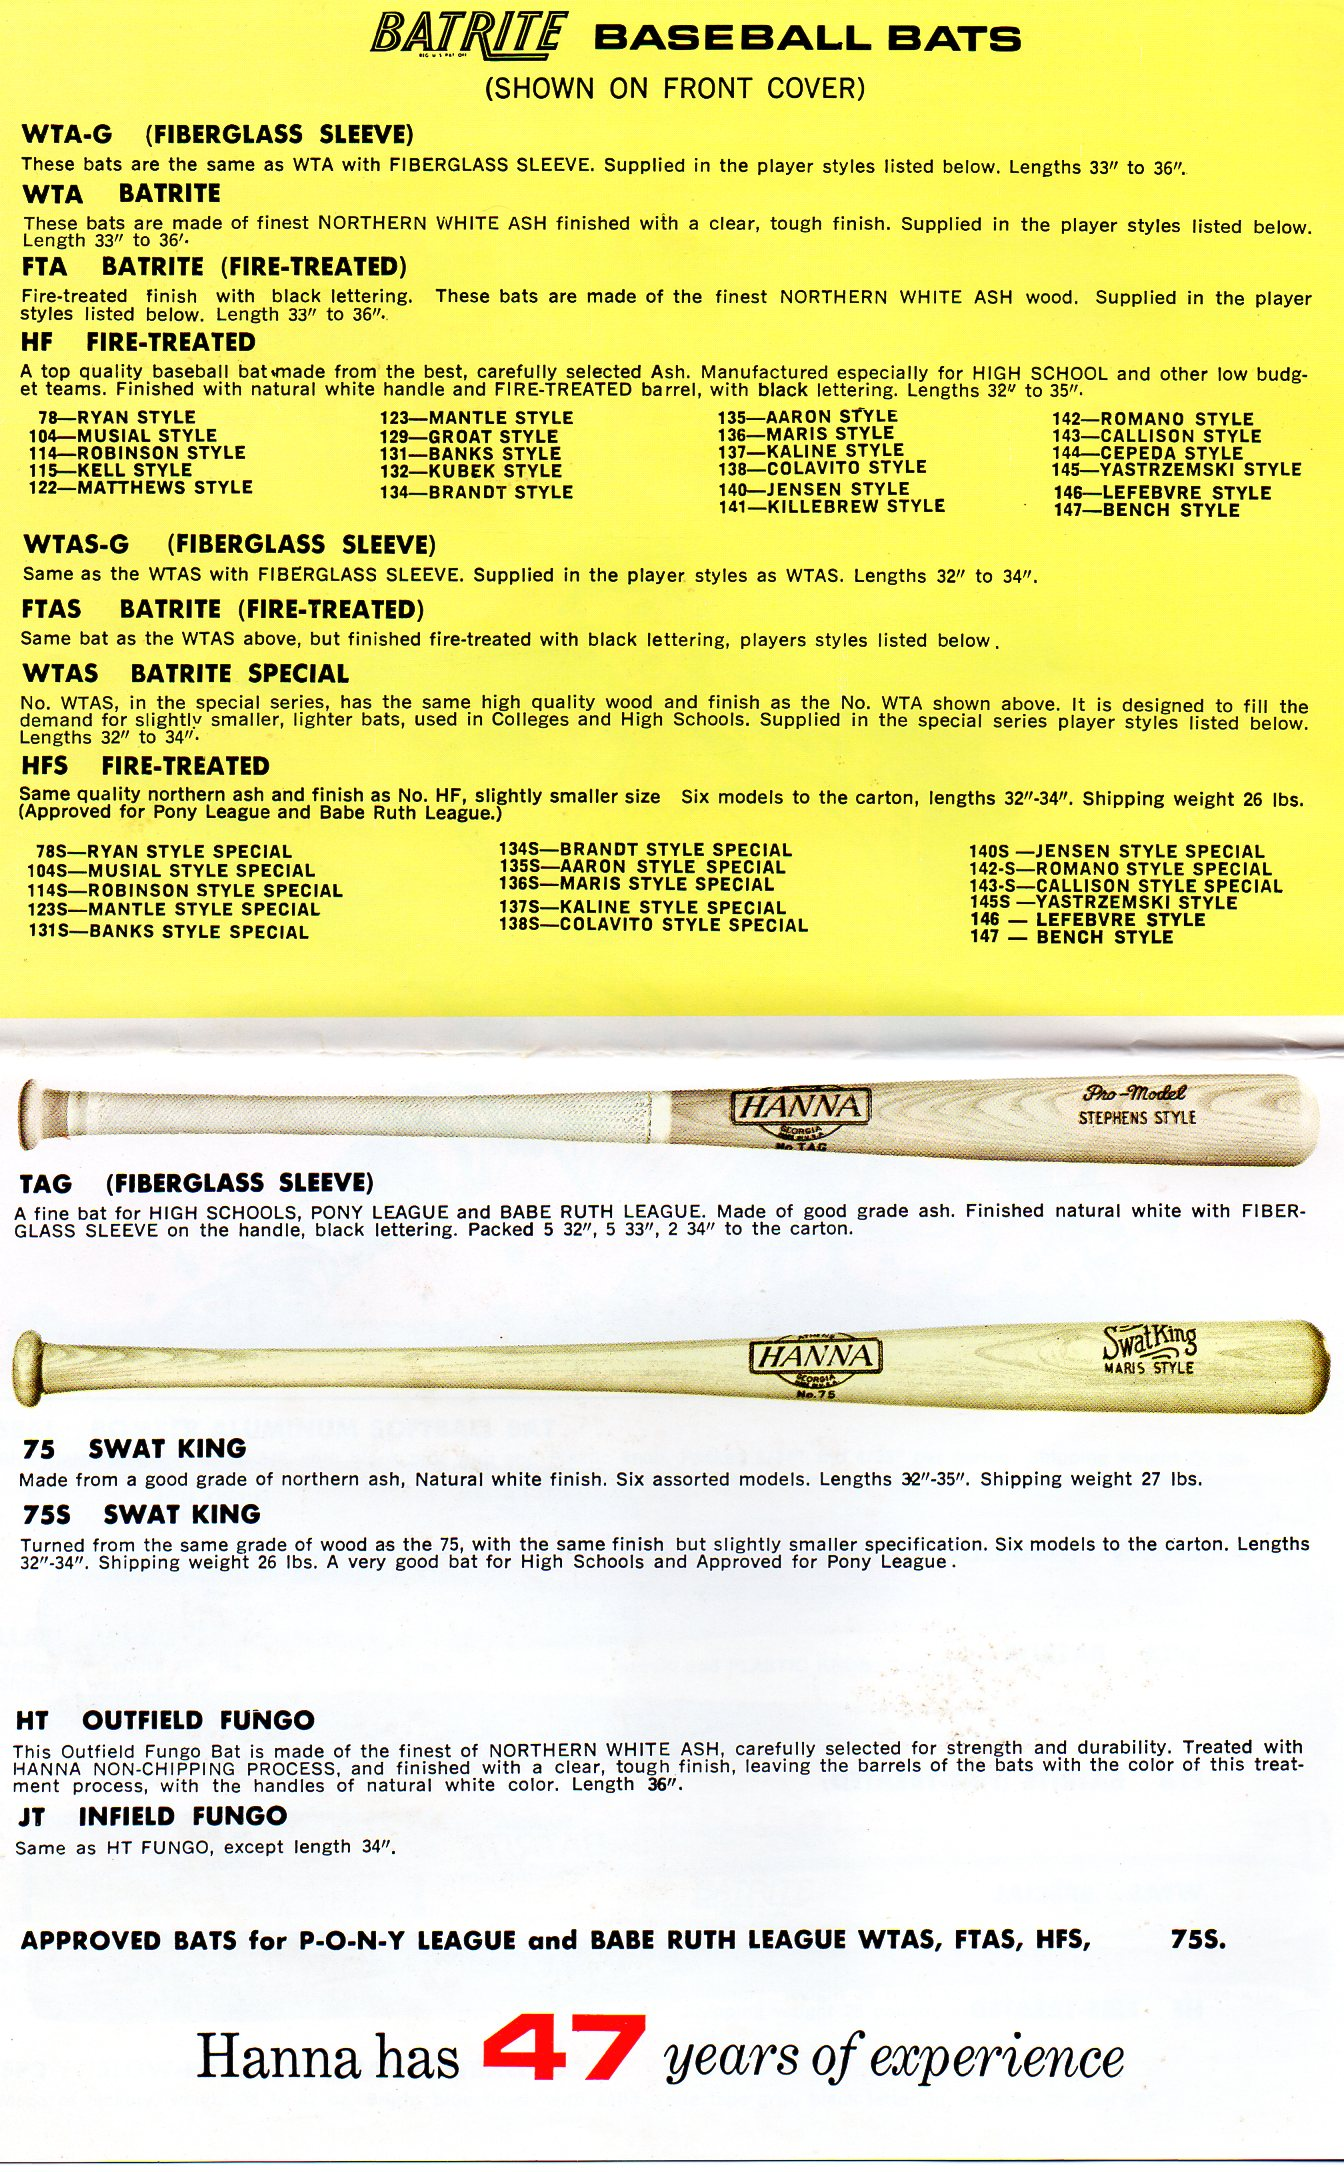 1973 hanna-batrite catalog